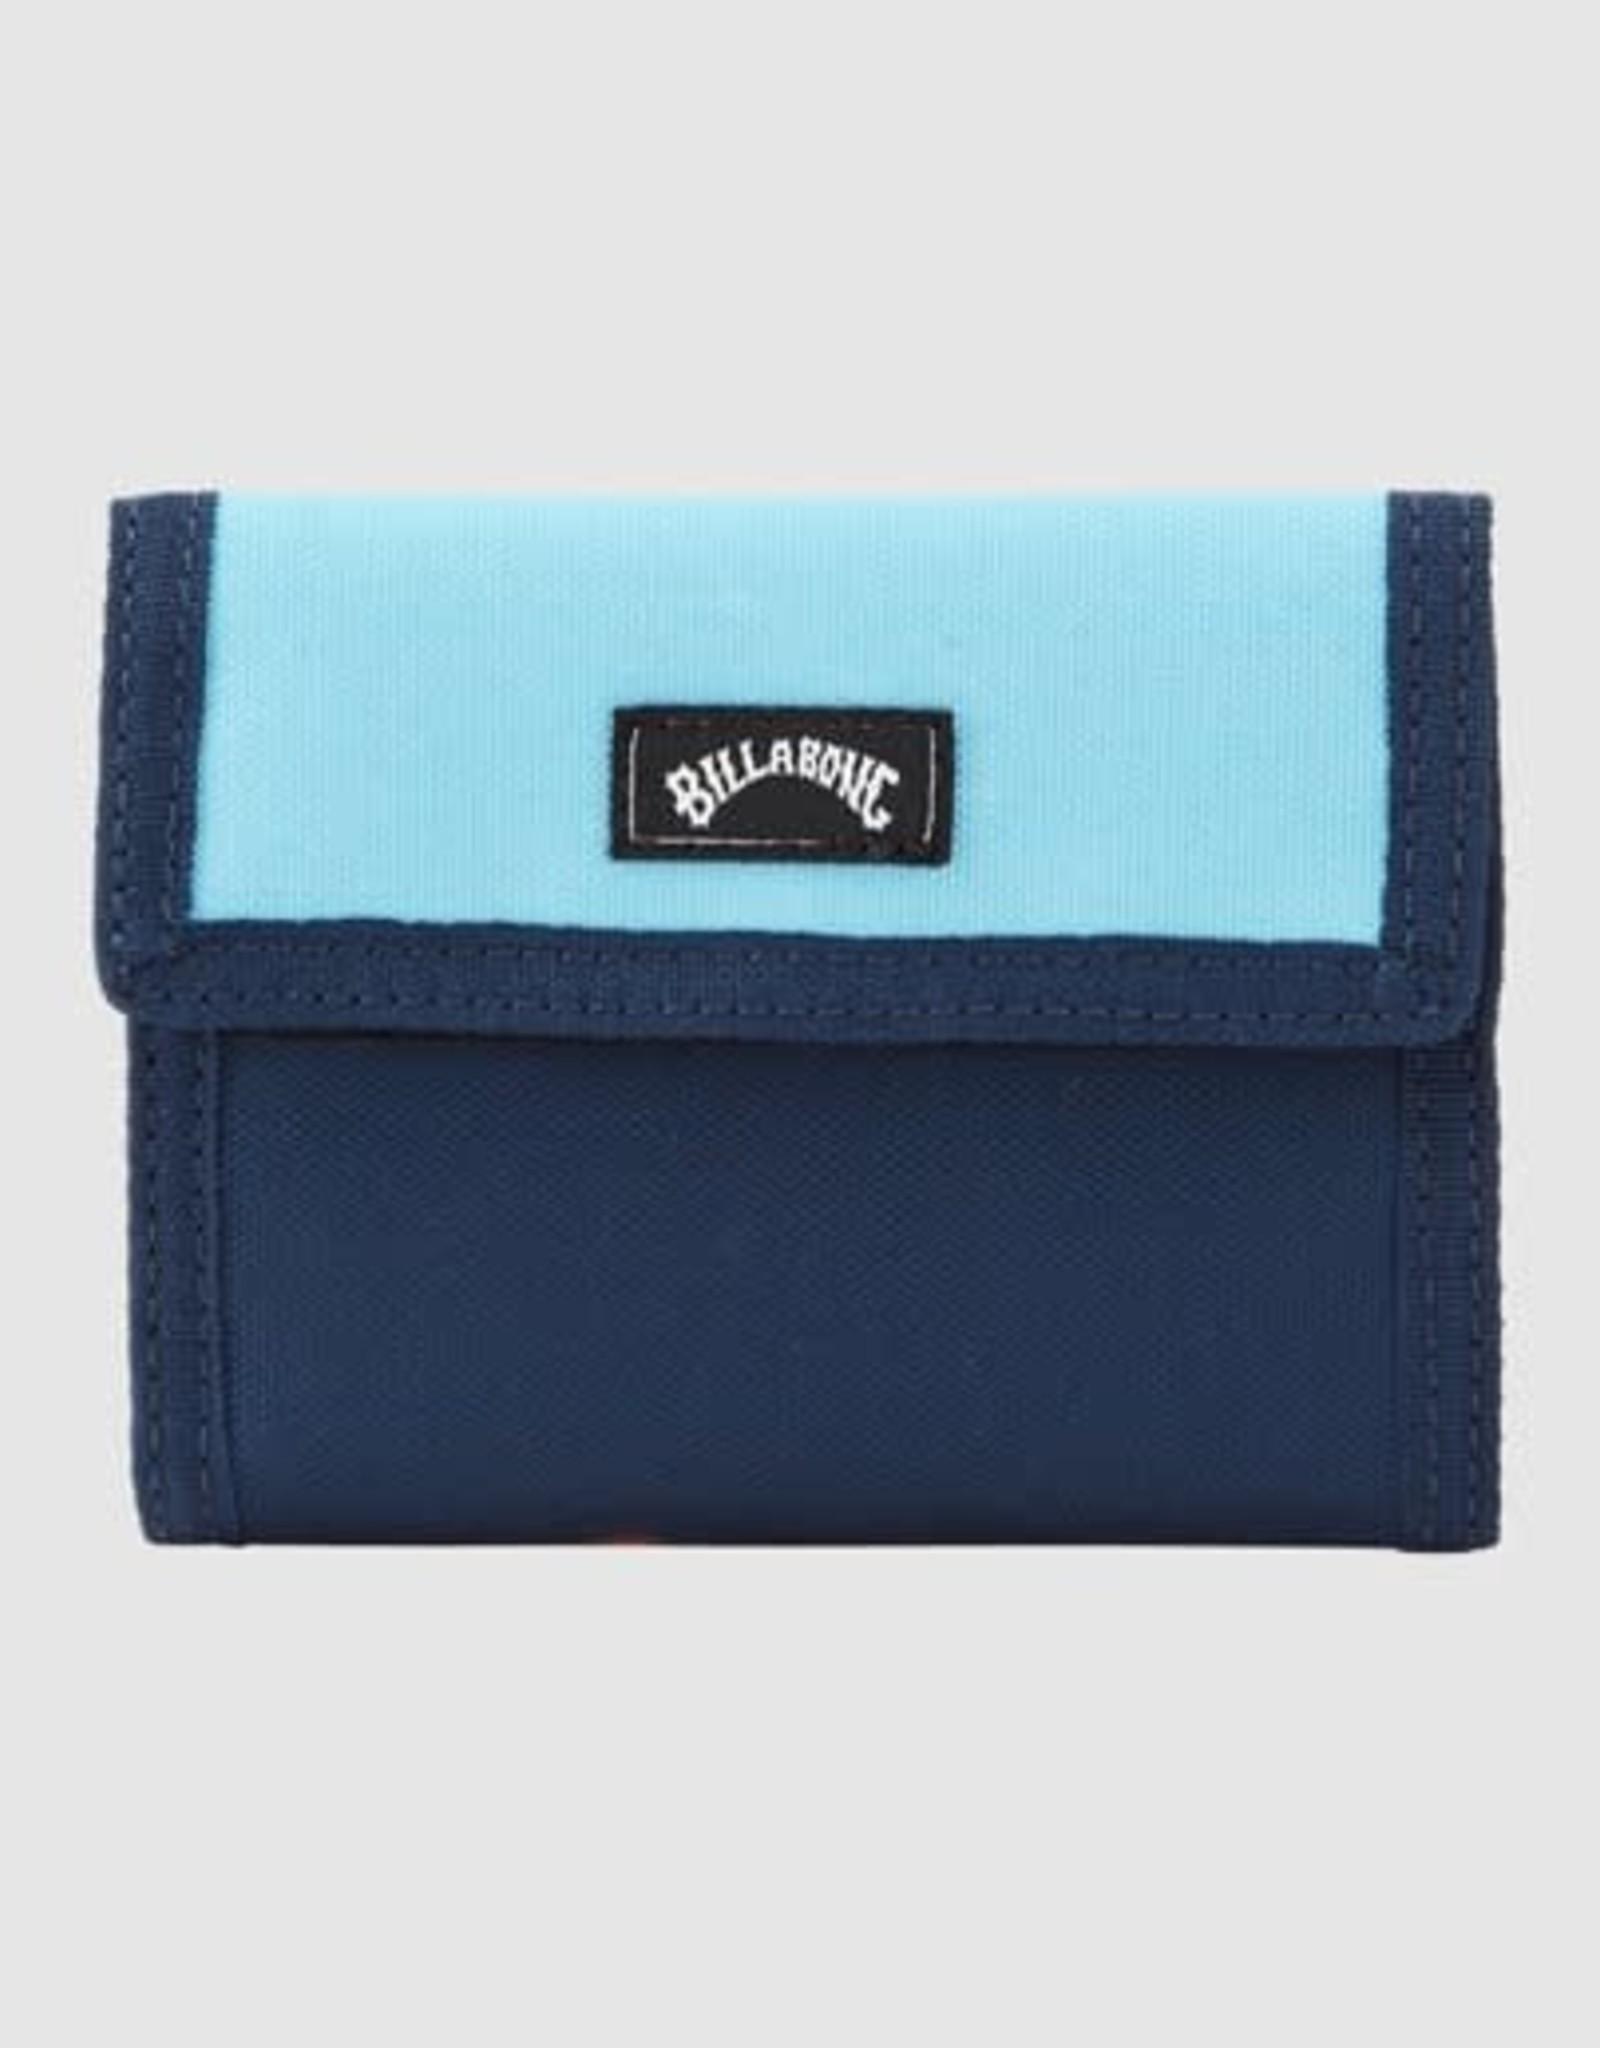 BILLABONG Tribong Lite Tri-Fold Wallet